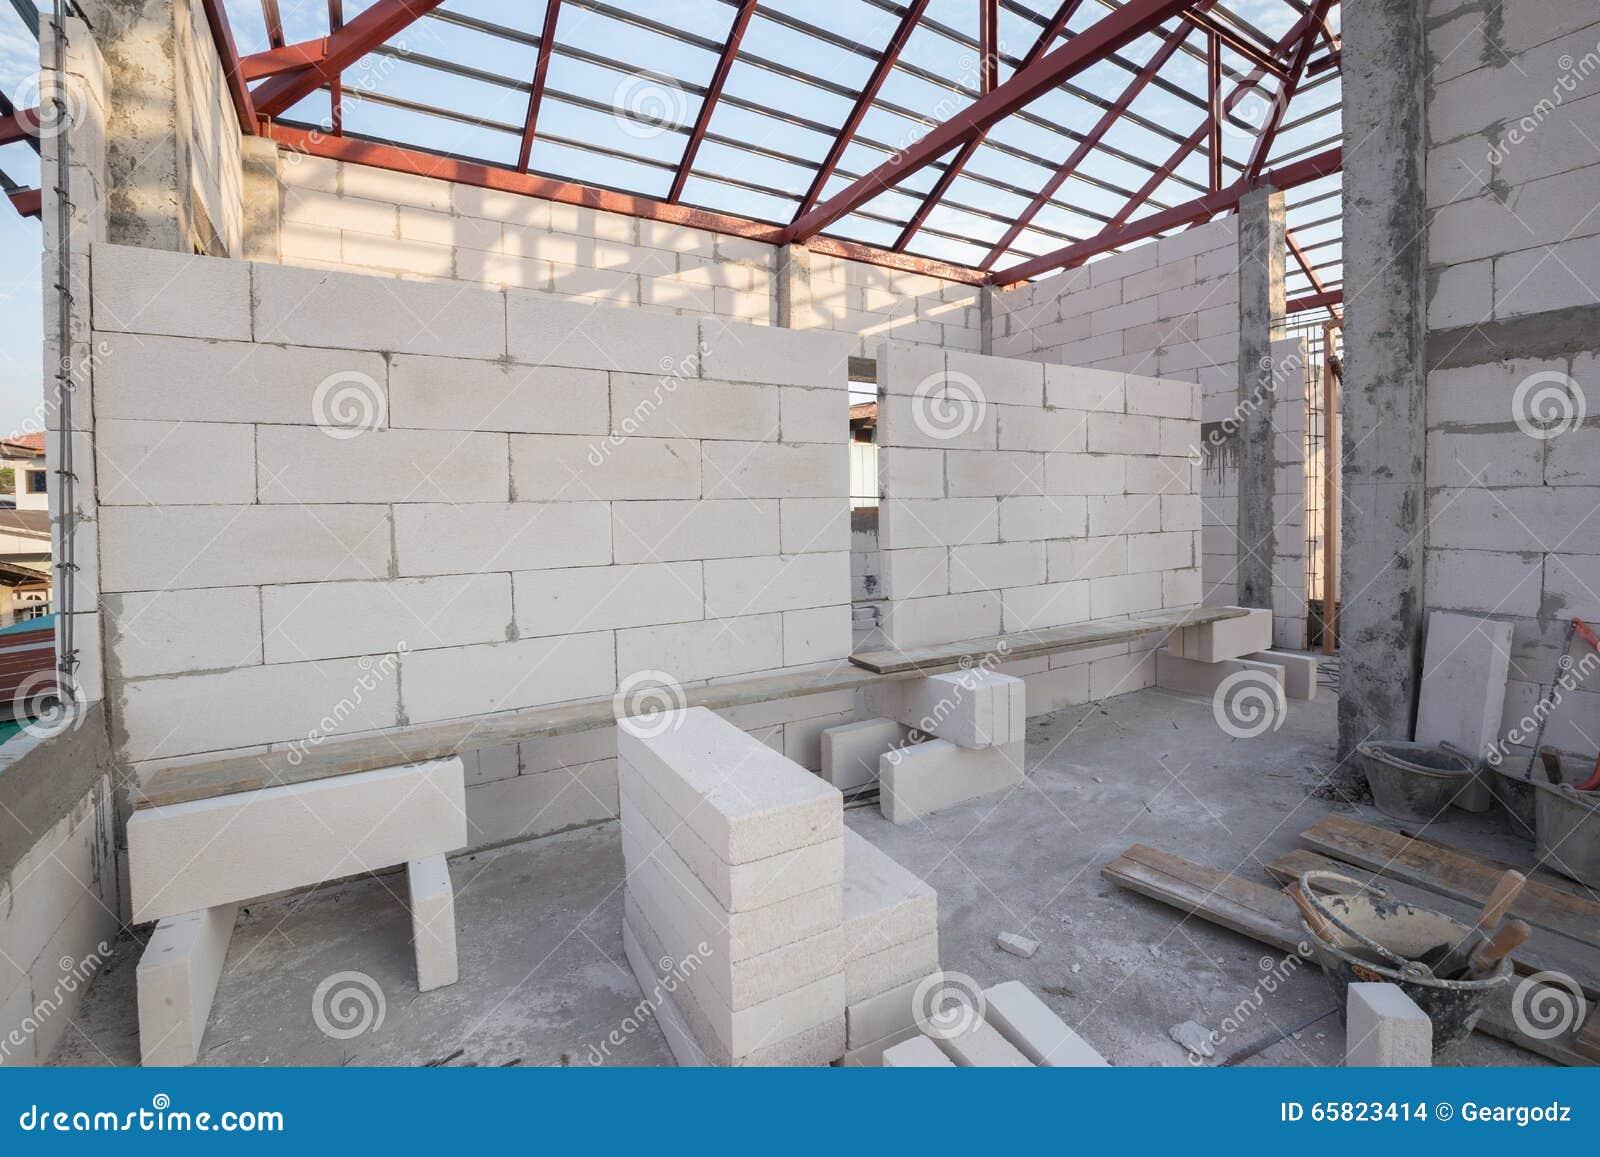 Stack of white lightweight concrete block foamed concrete for Foam concrete house construction